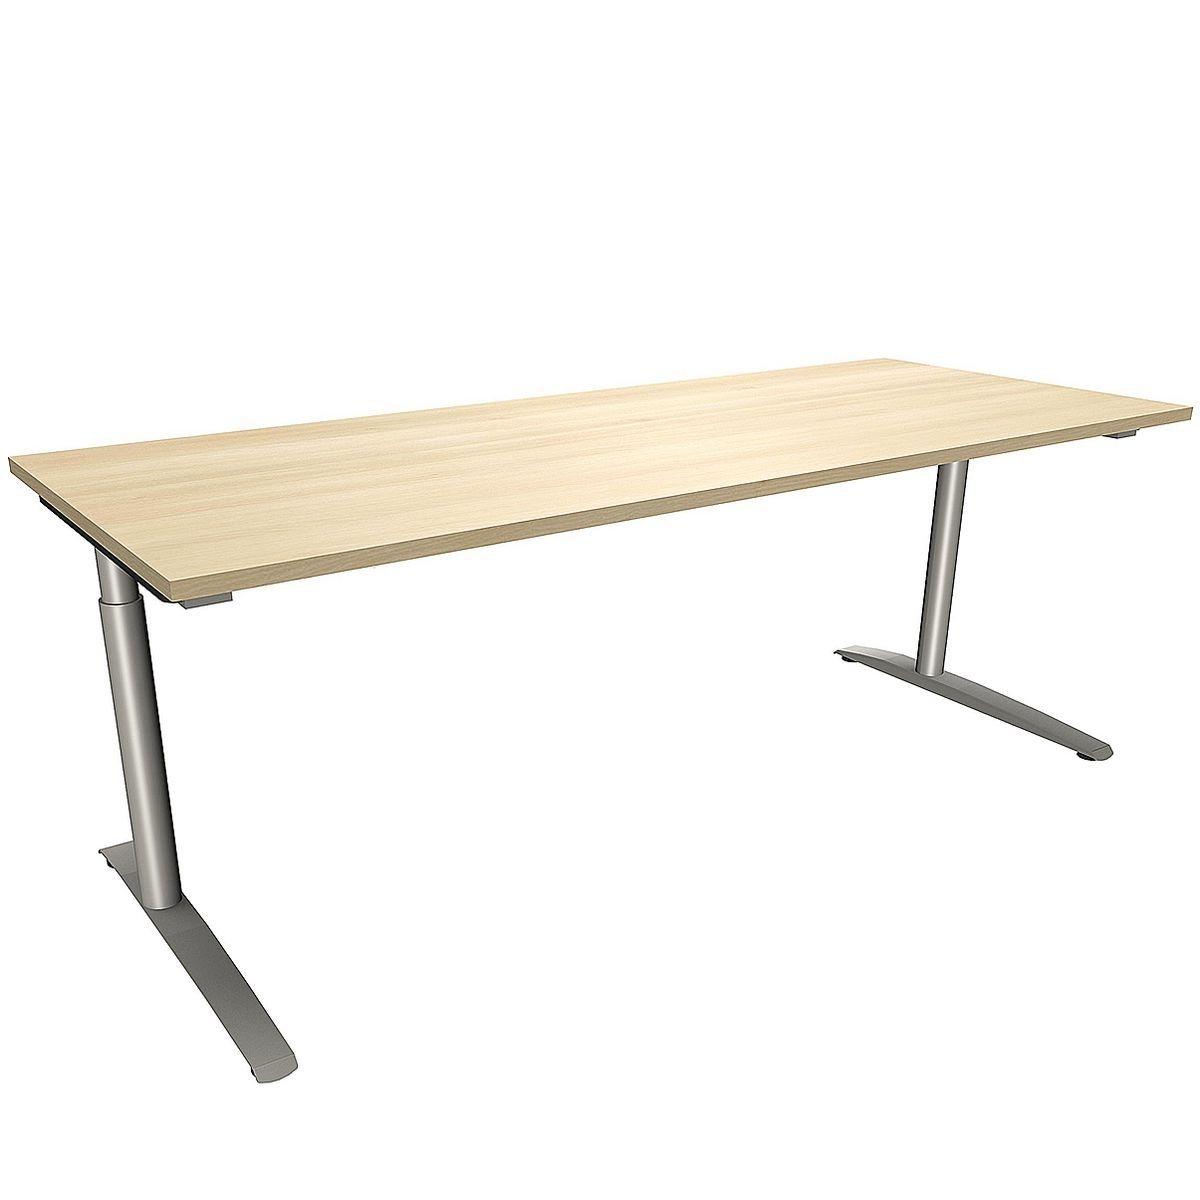 FMBUEROMOEBEL Schreibtisch 200 cm C-Fuß »Fastline« | Büro > Bürotische > Schreibtische | FMBUEROMOEBEL